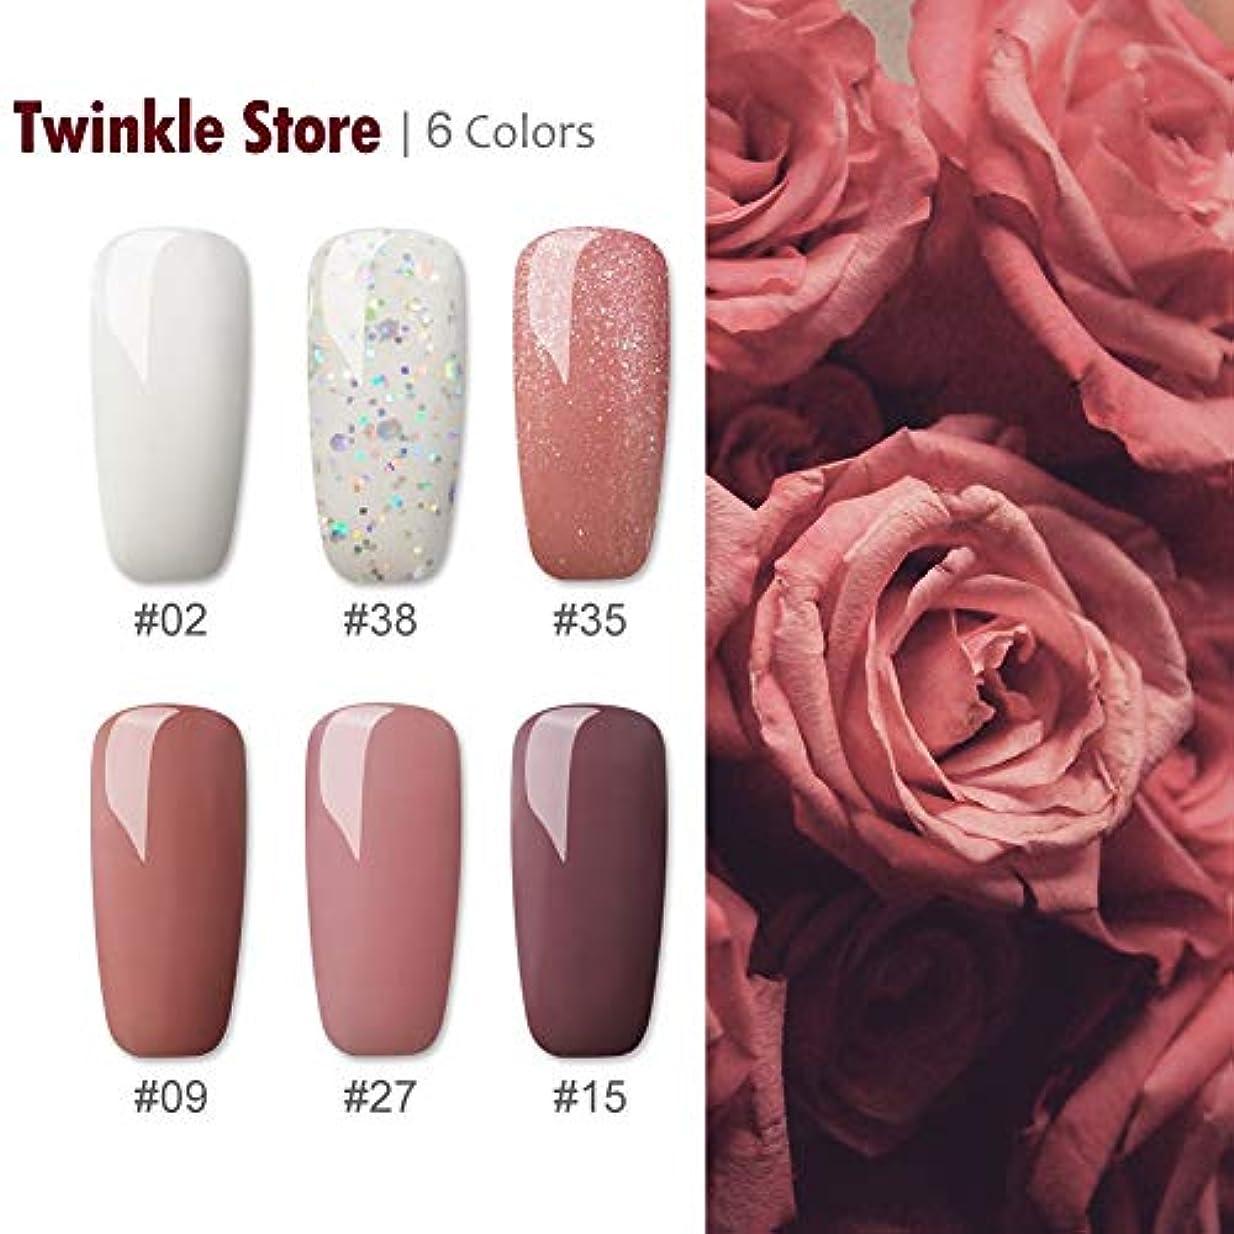 Twinkle Store ジェルネイルカラー 6カラージェルネイル カラージェル 自宅ネイル セルフネイルキット ジェルネイルキット スターターキット 6本セット